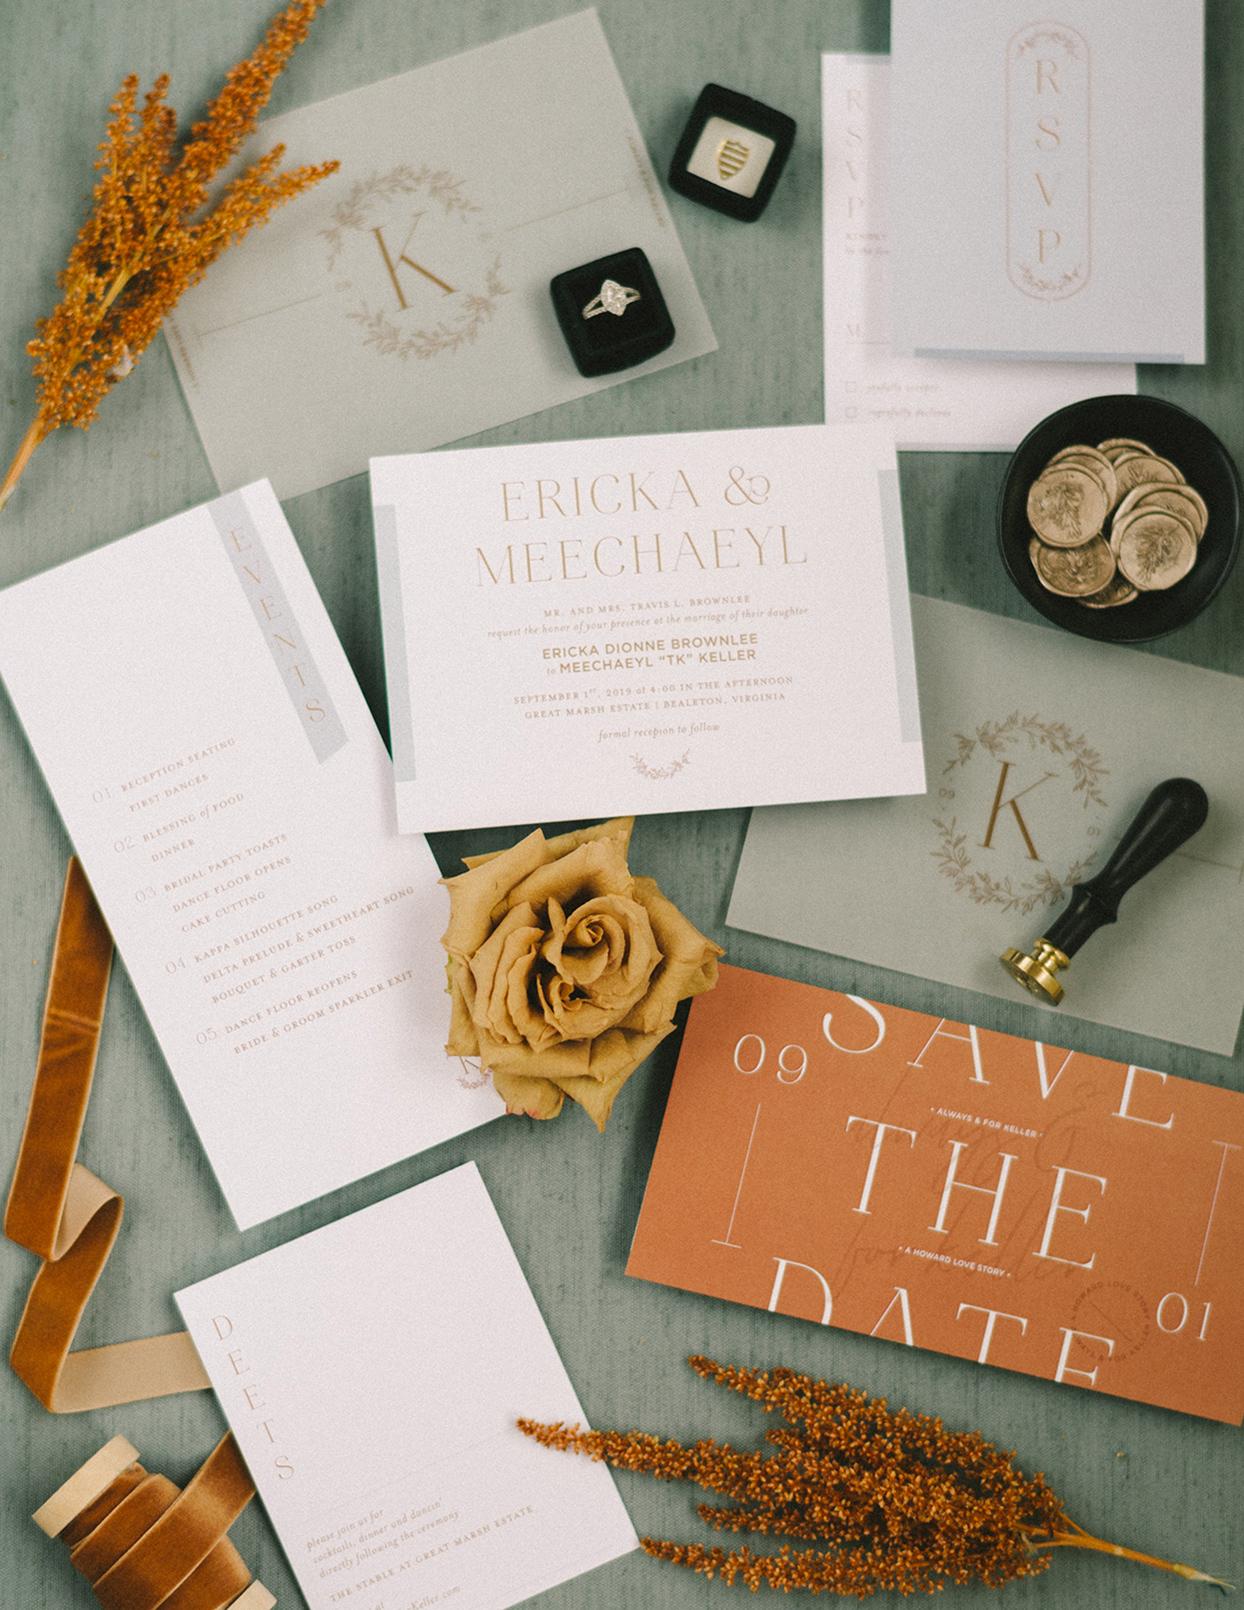 ericka meechaeyl wedding invites in rust and white